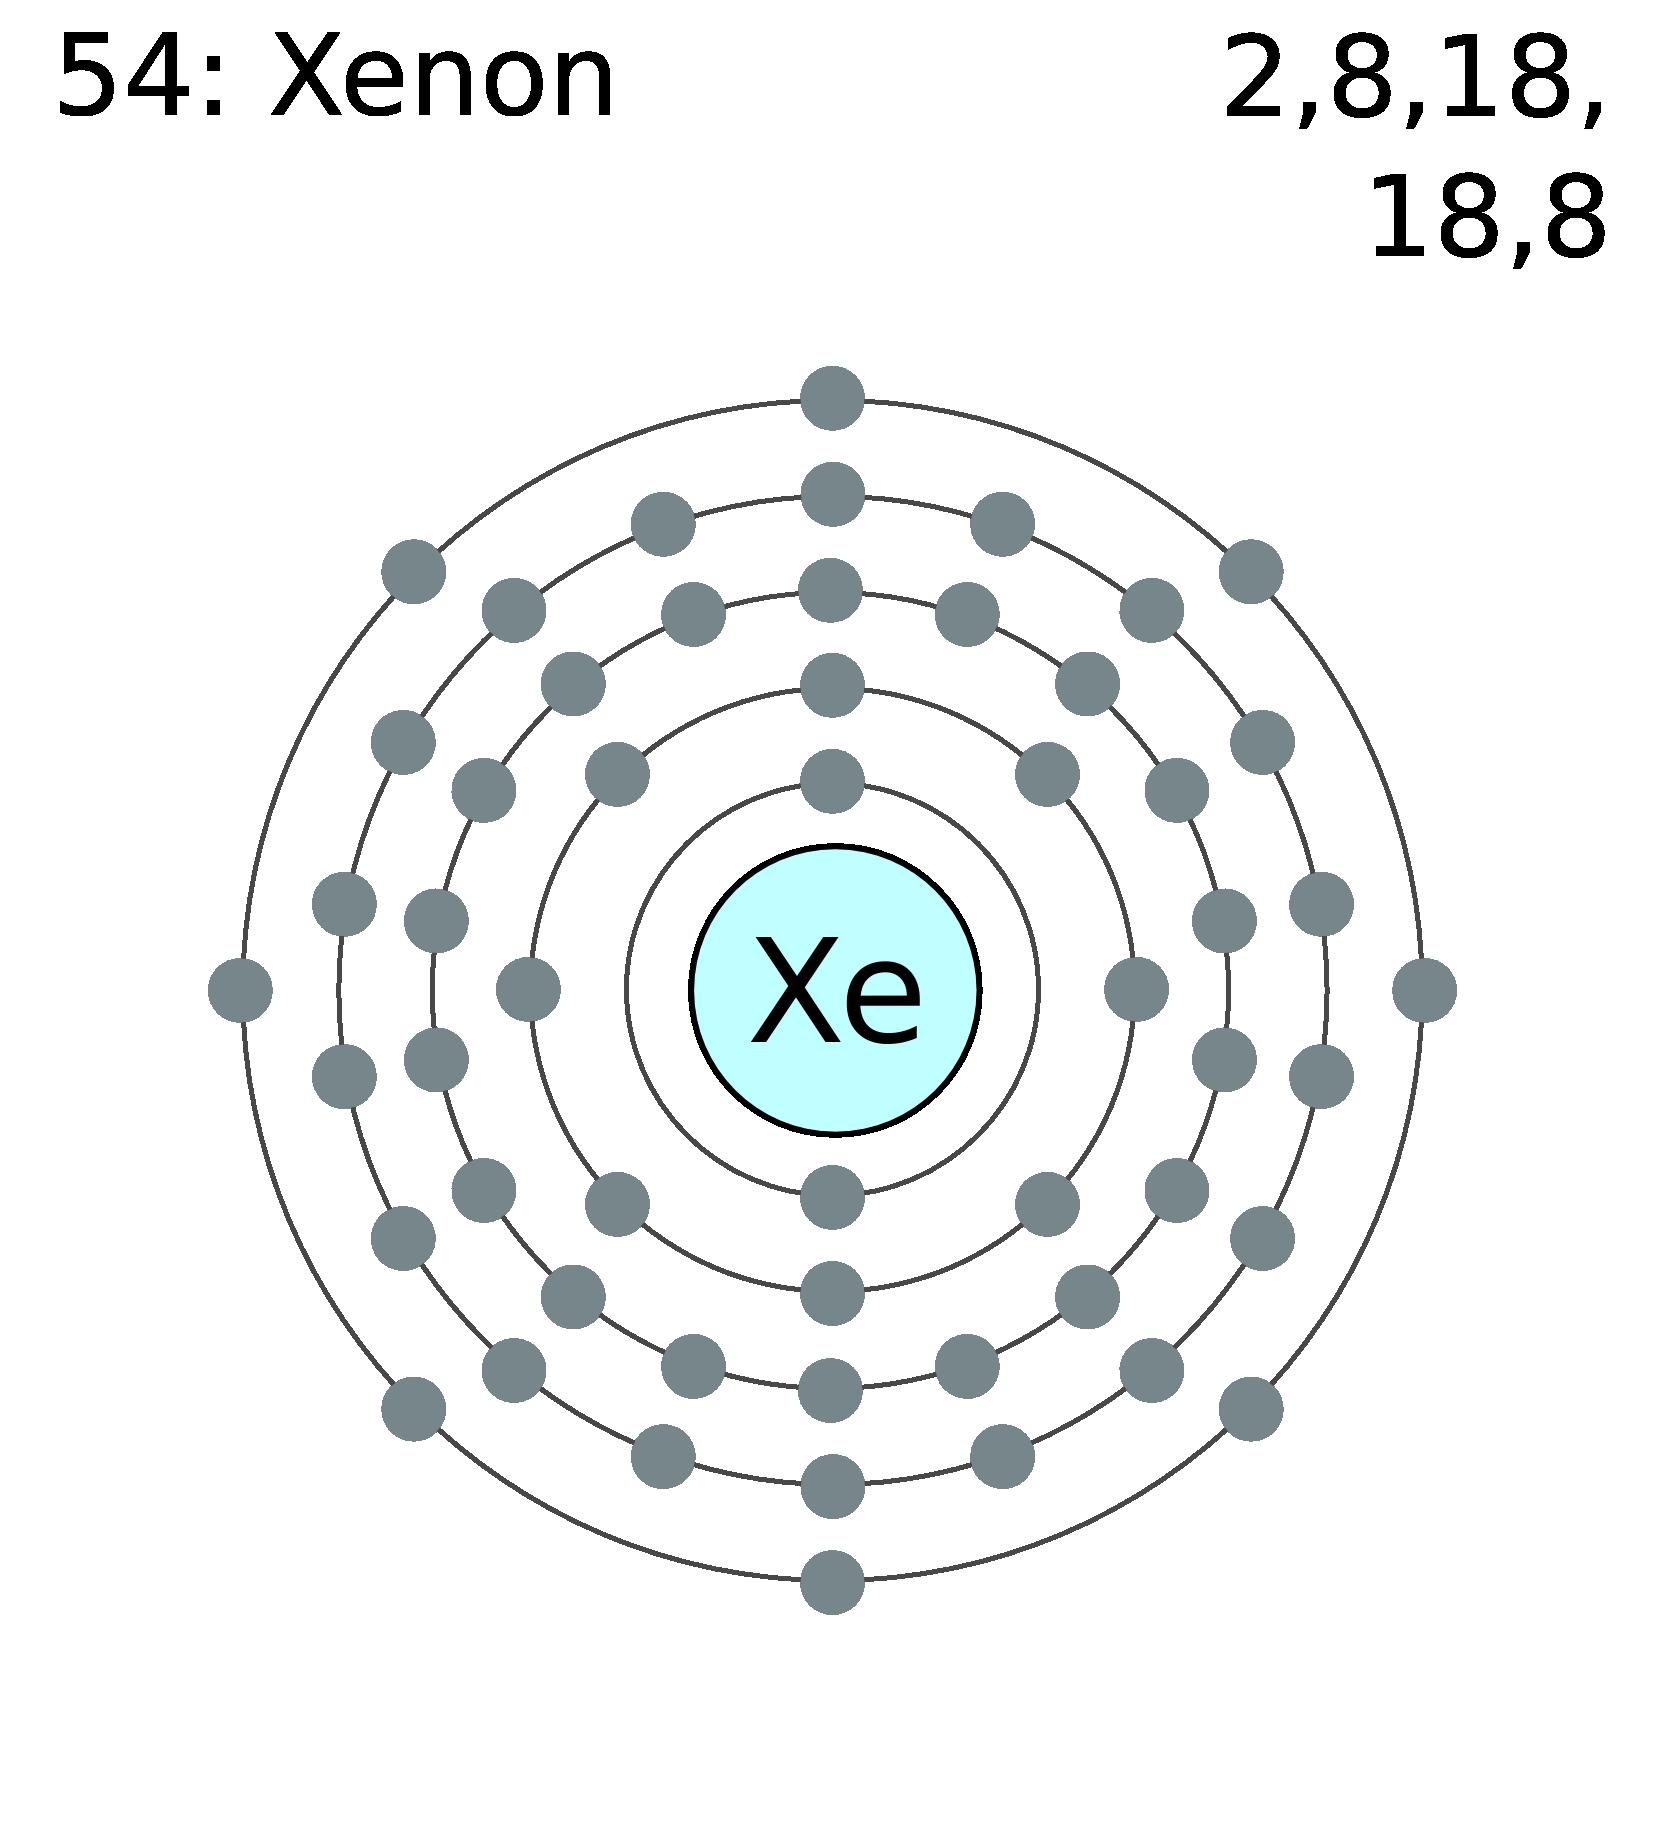 Fileelectron shell 054 xenong wikimedia commons fileelectron shell 054 xenong urtaz Images